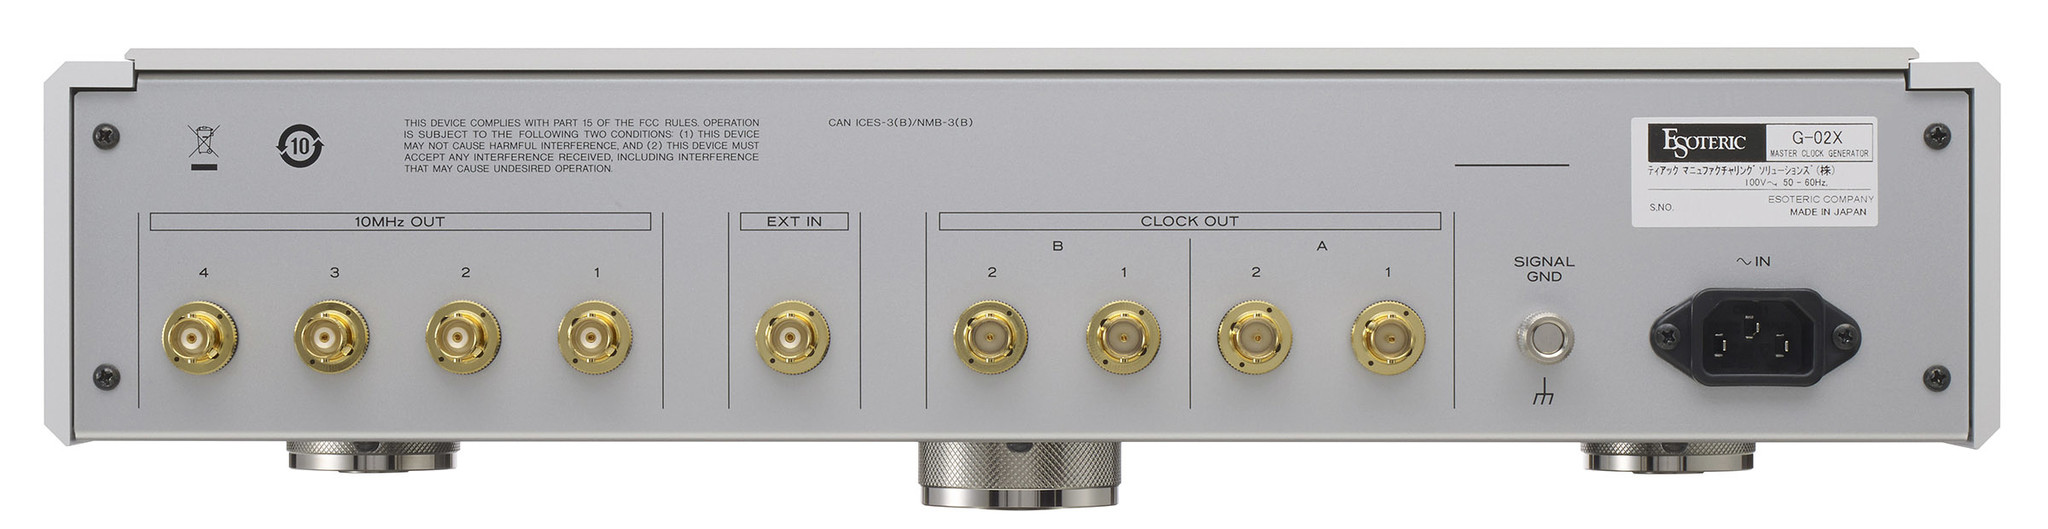 Esoteric G - 02 X Master Clock